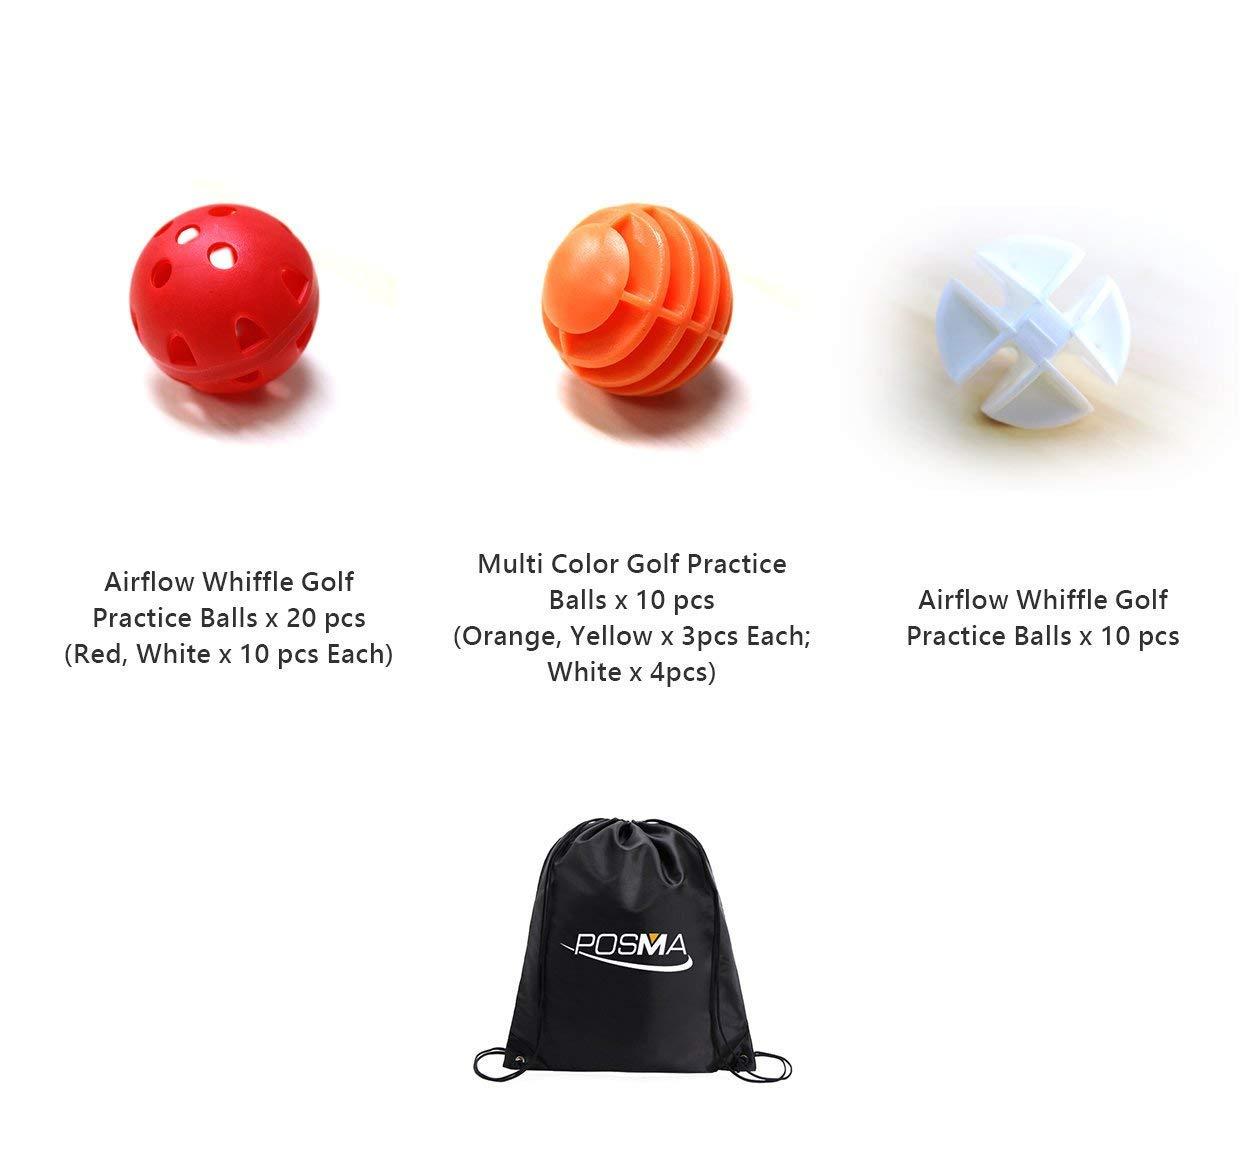 POSMA PB050A Airflow Whiffle Golf Practice Ball Multi Color + Multi Color Golf Balls + White Golf Ball + Carry Bag